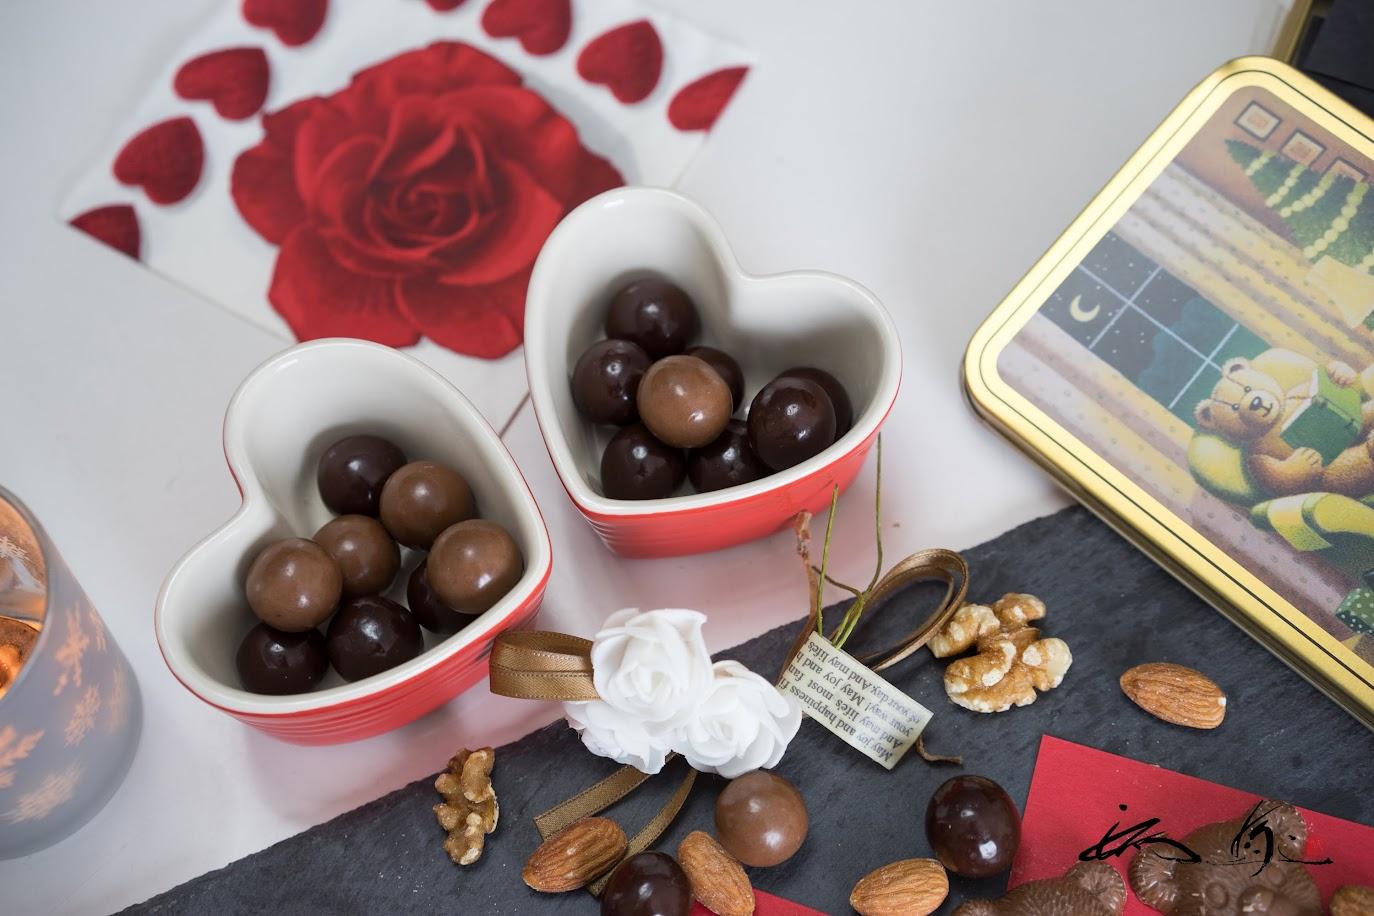 Berrychocs(イチゴとラズベリー風味のフルーツ味)